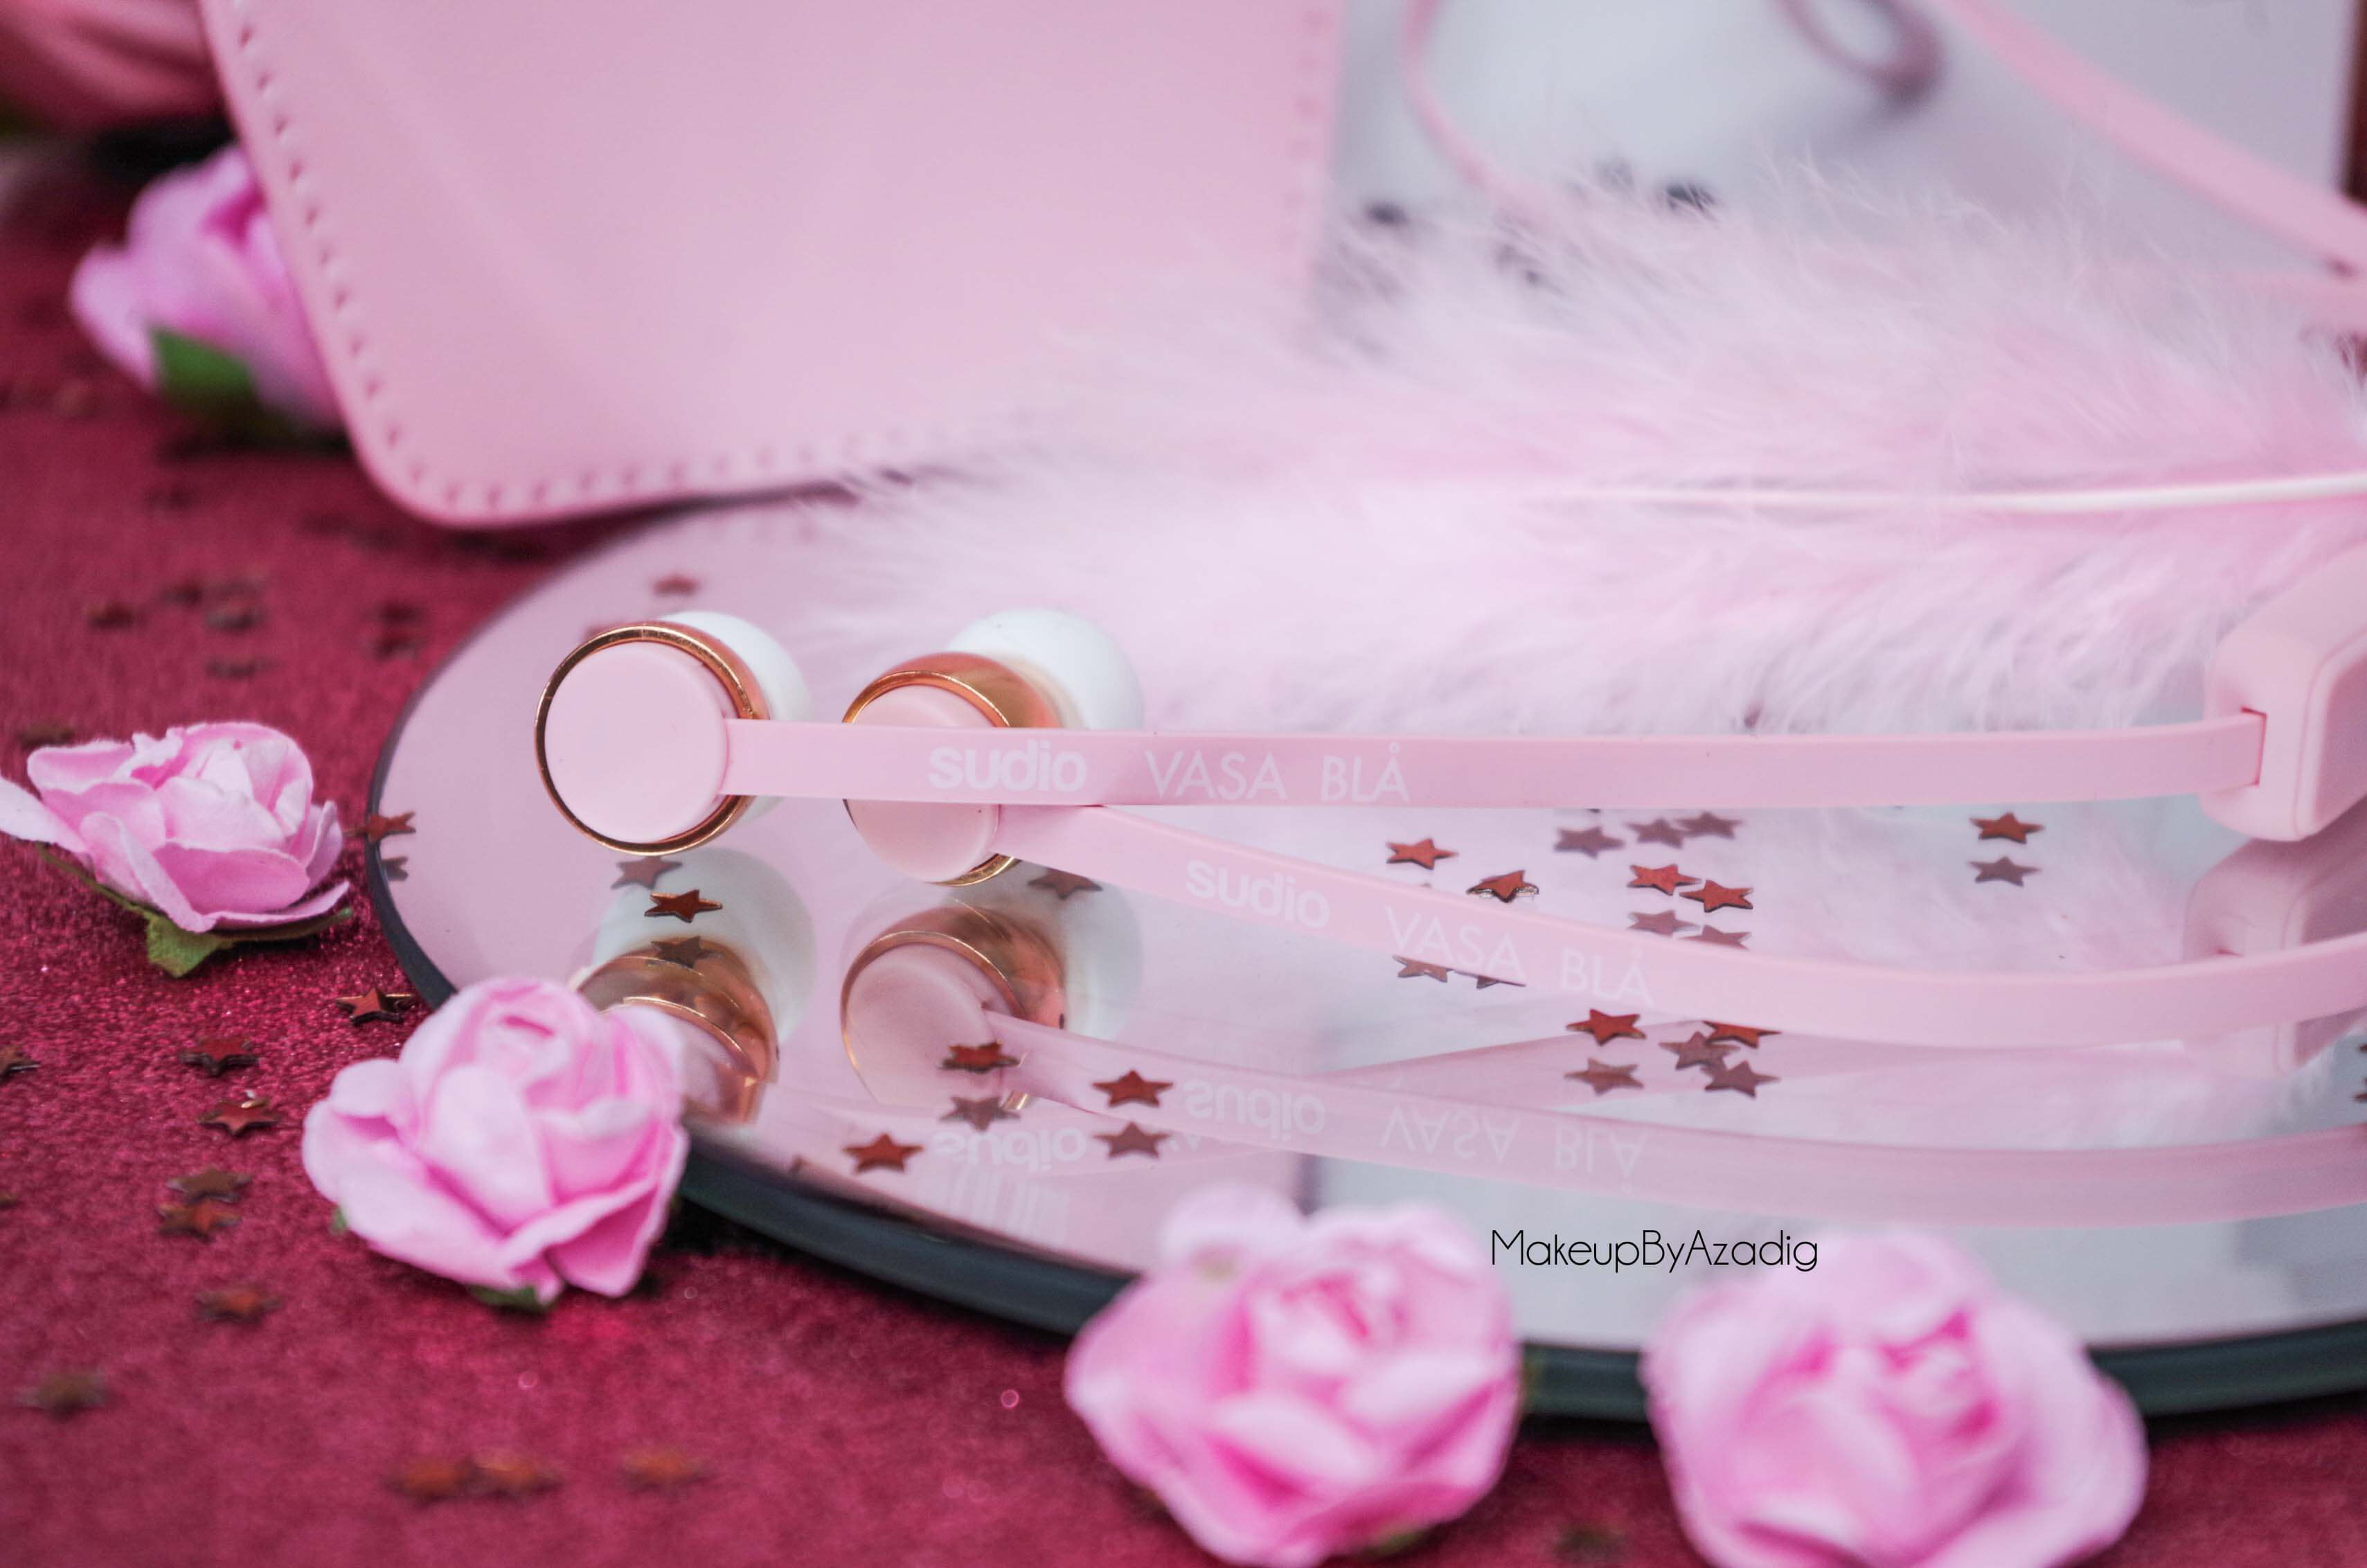 ecouteurs-casque-sans-fil-bluetooth-design-tendance-sudio-sweden-rose-vasa-bla-makeupbyazadig-avis-prix-pink